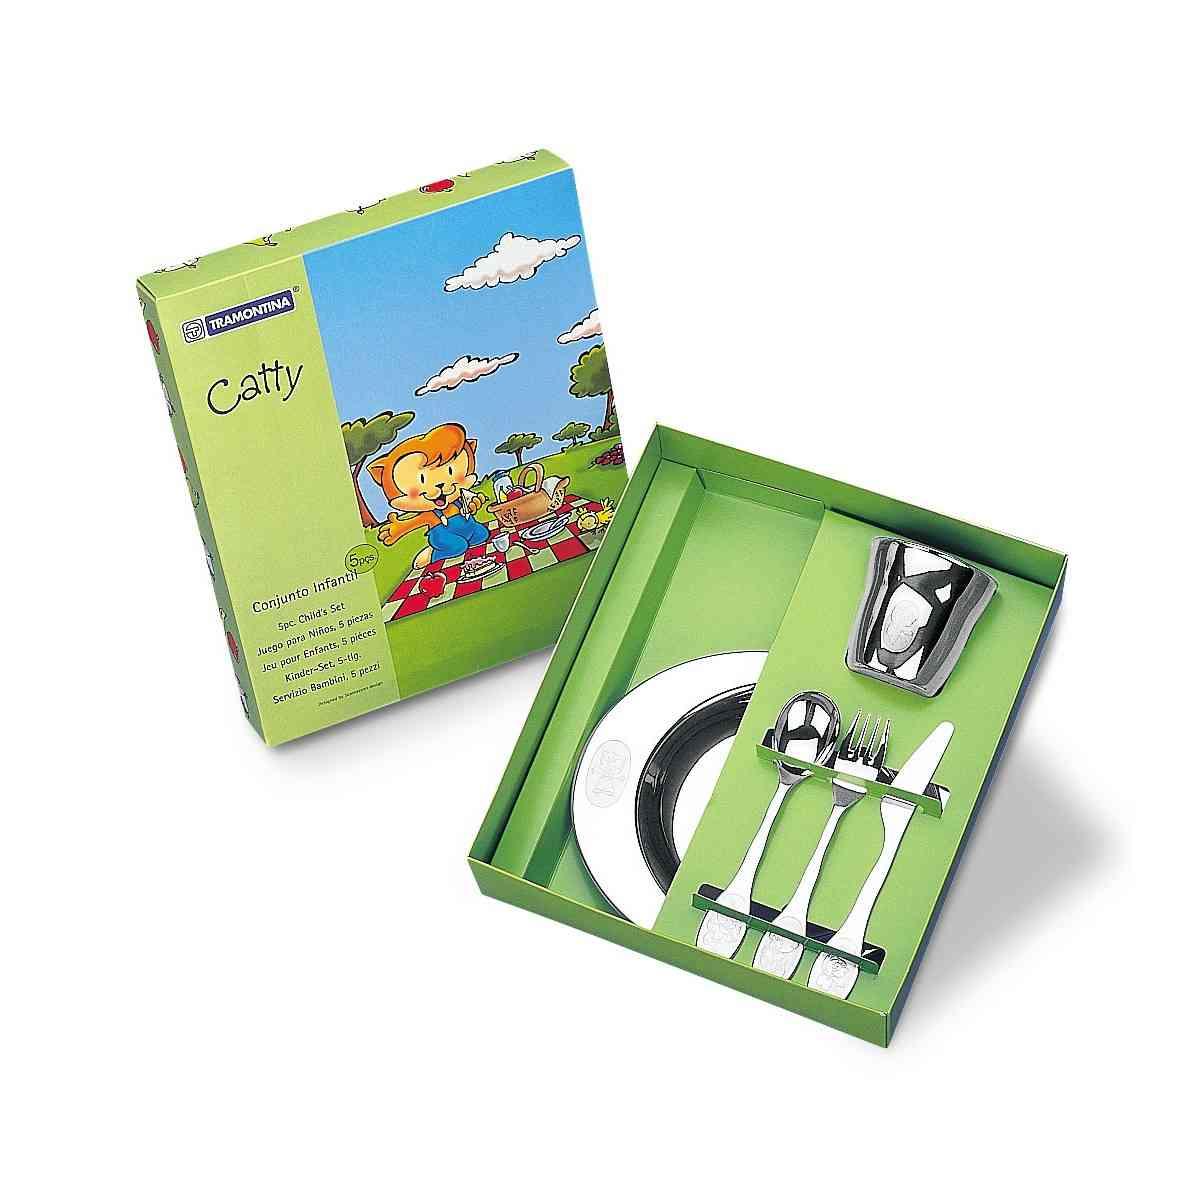 Kit Infantil Tramontina para Refeição em Aço Inox  5 Peças 64250940